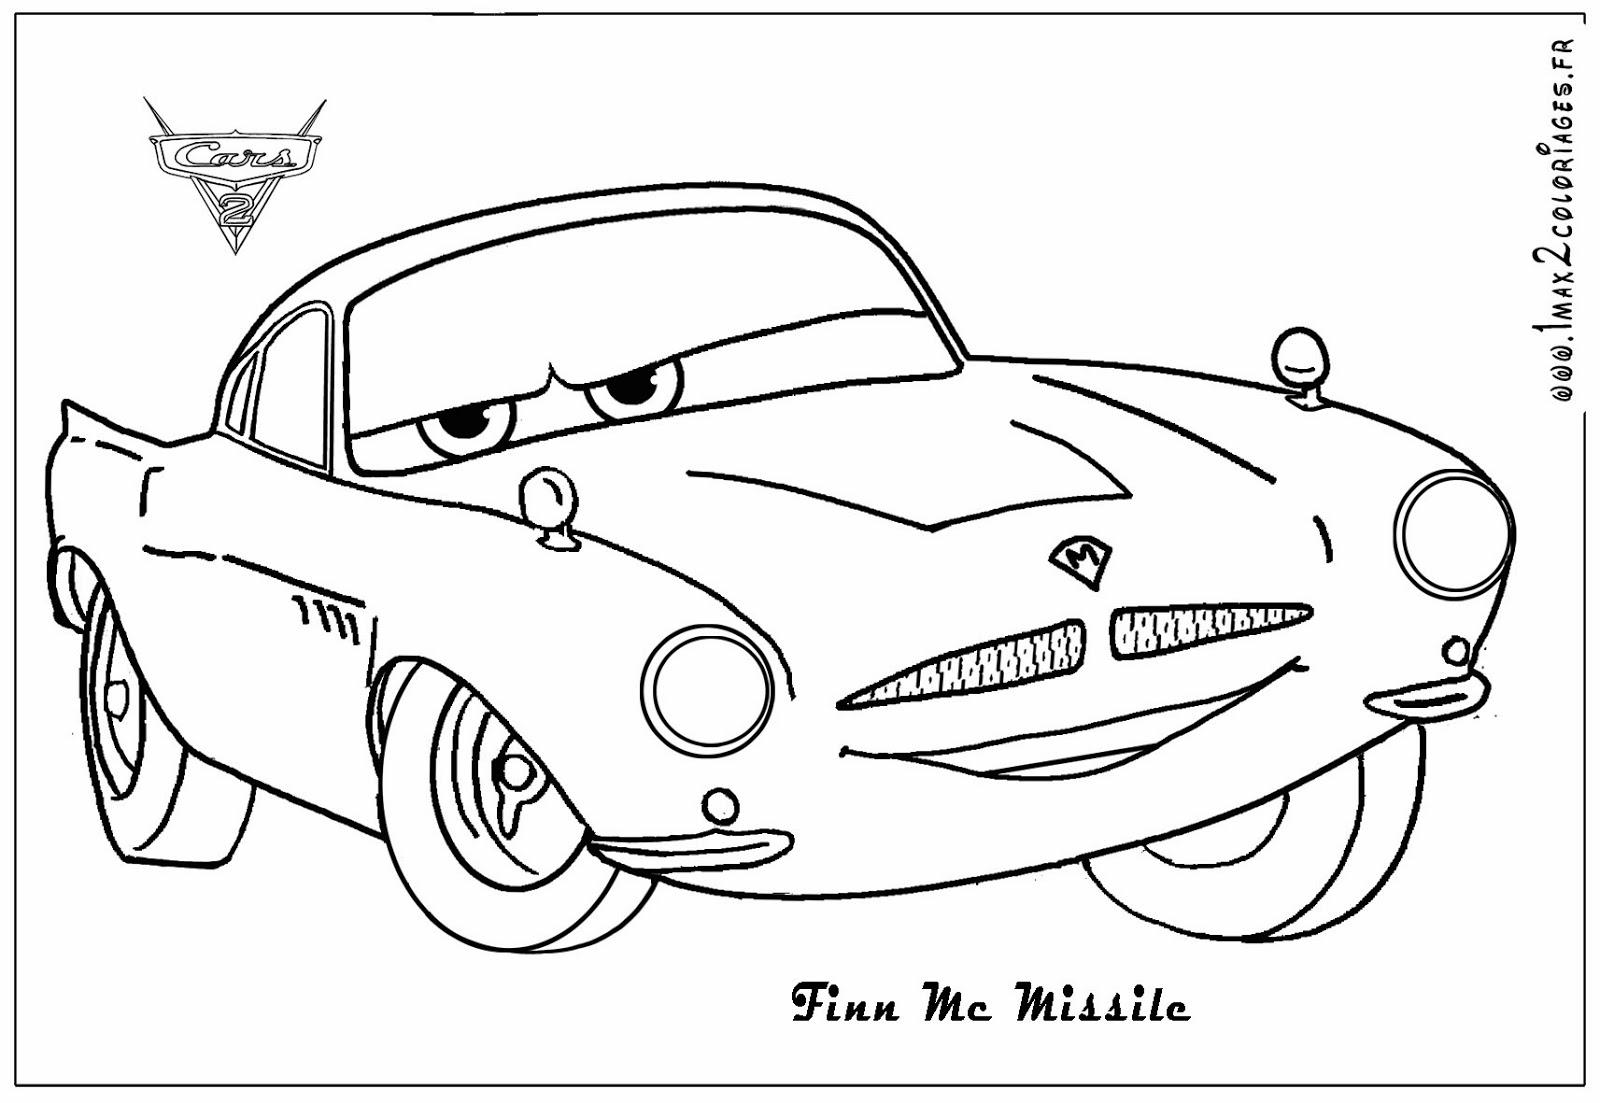 Mcqueen Cars Ausmalbilder : Gratis Ausmalbilder Lightning Mcqueen Free Download Ausmalbilder